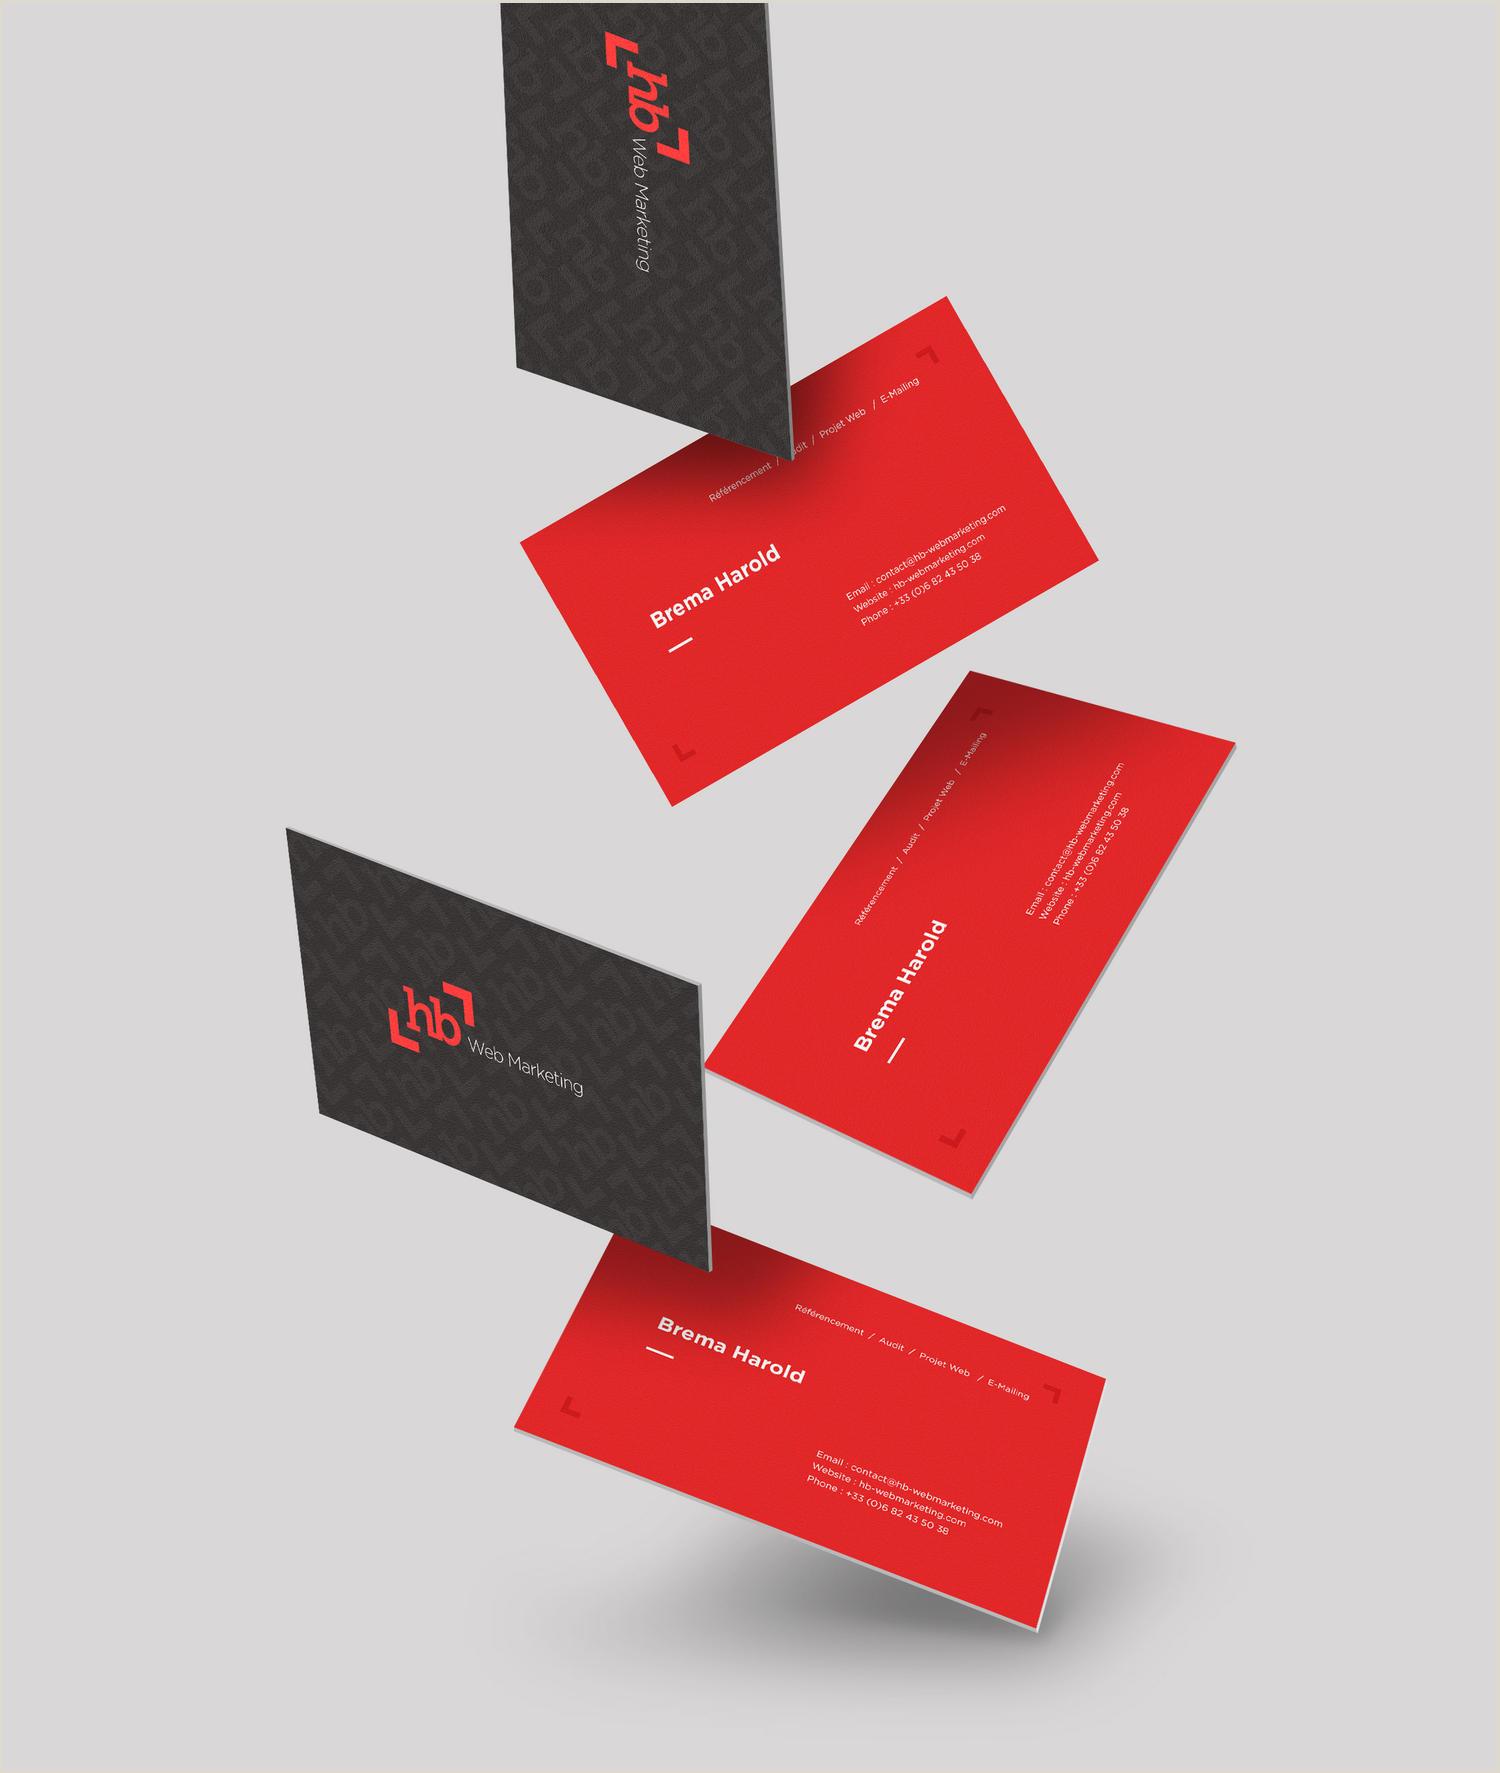 Visitcard Design Business Card Design By Alanaragondesign On Envato Studio